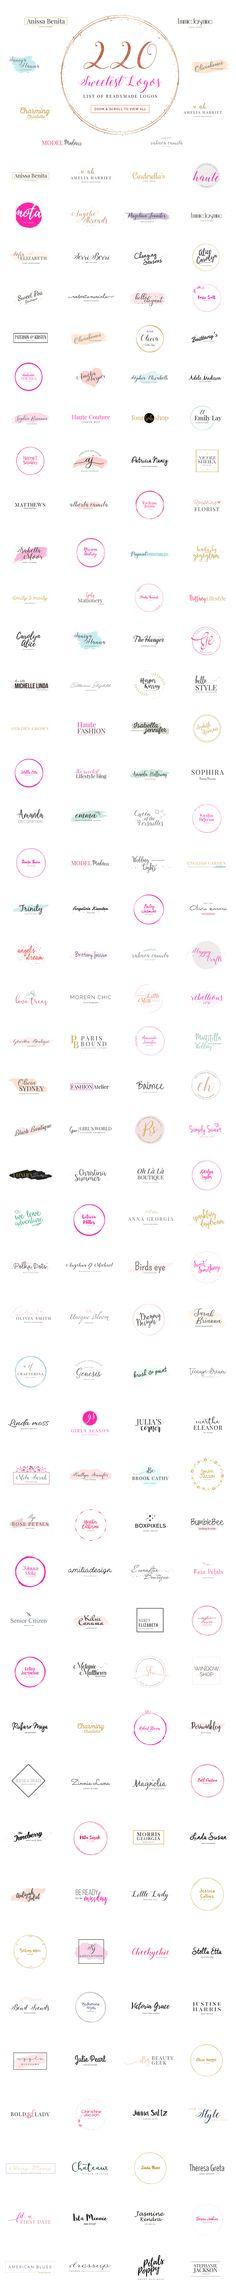 Best Selling GIRLBOSS Logo Creator by SNIPESCIENTIST on @creativemarket